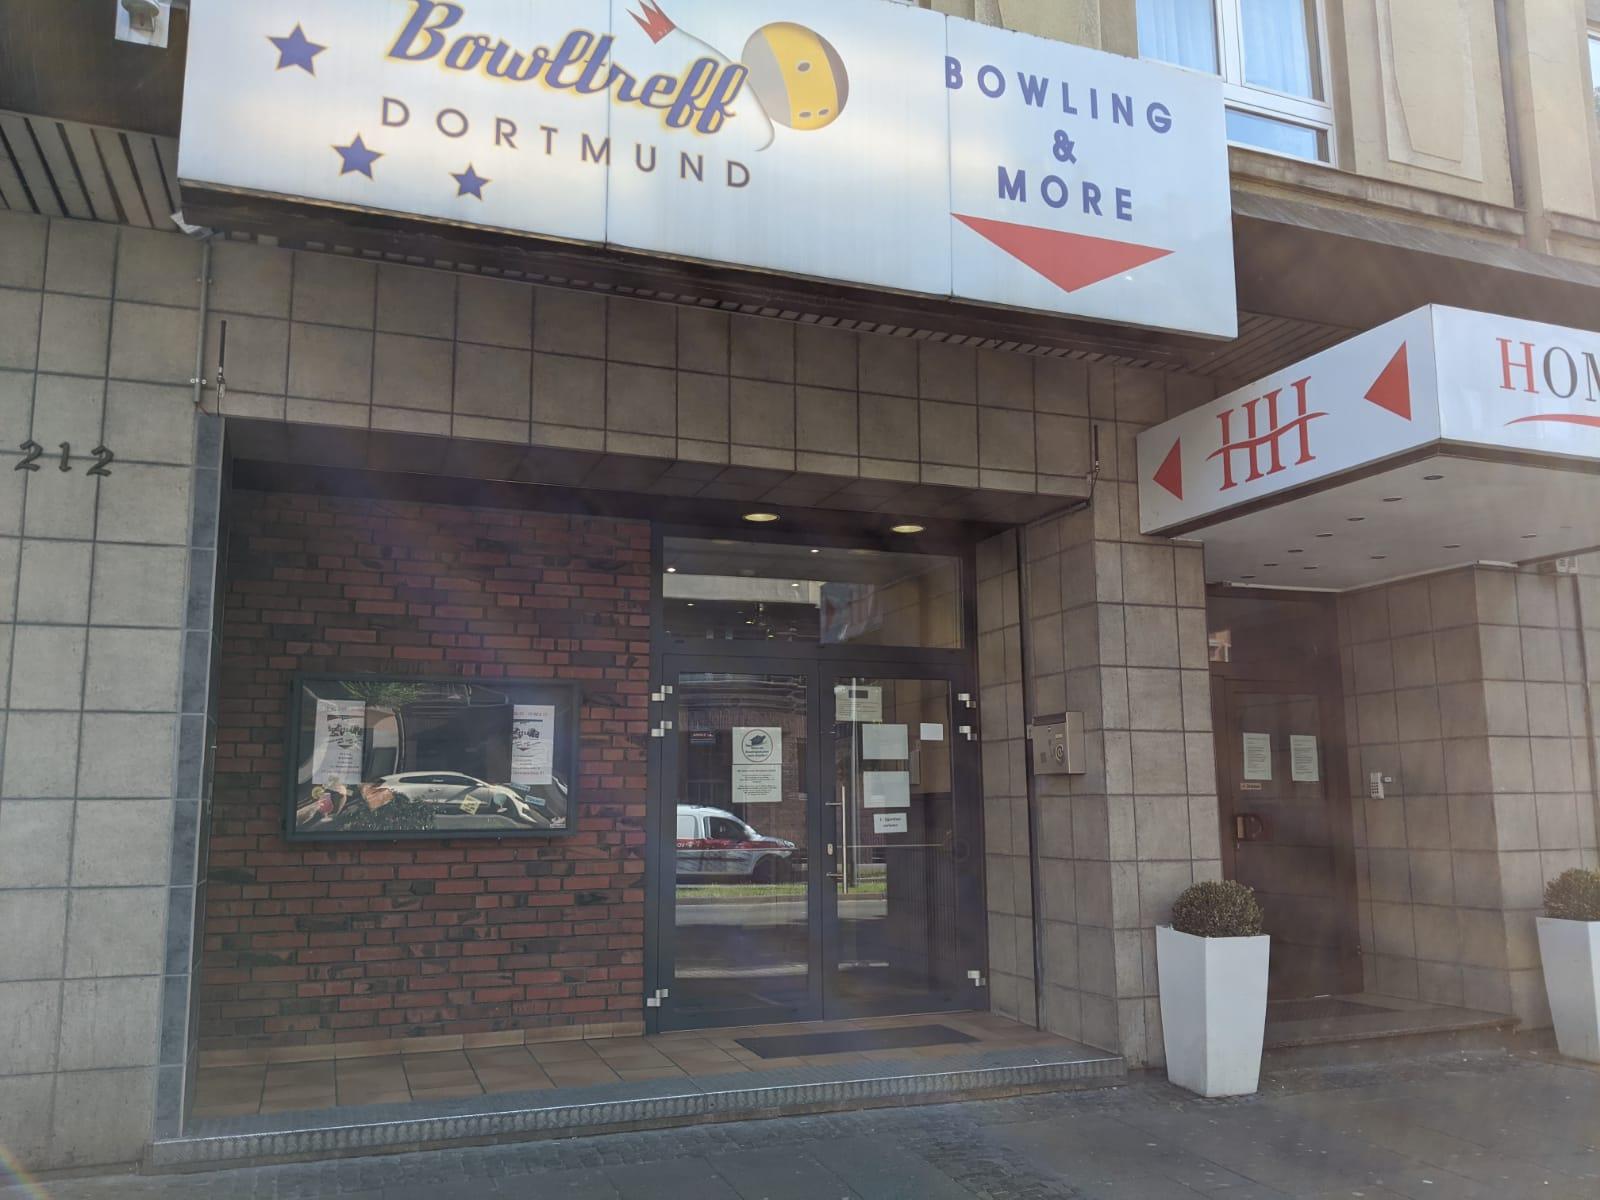 Bowltreff Dortmund